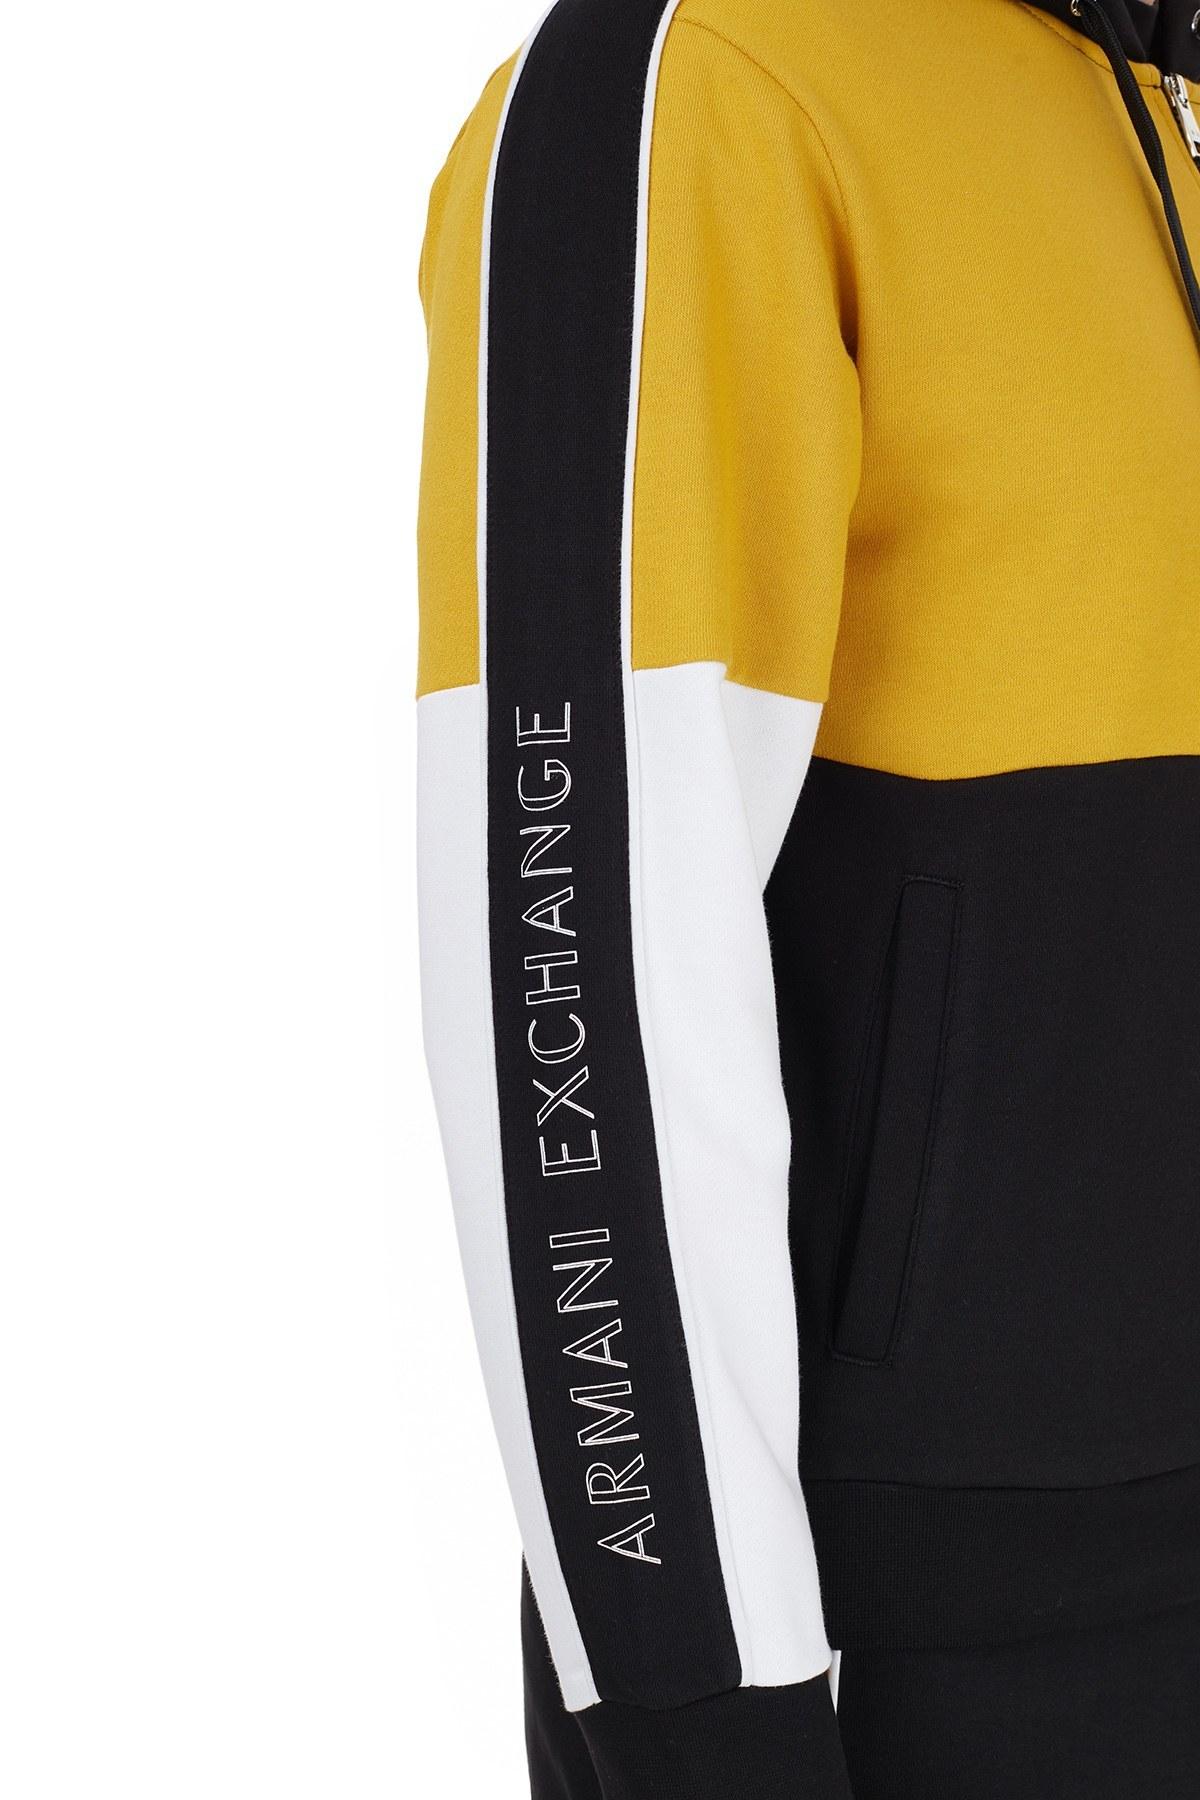 Armani Exchange Pamuklu Renk Bloklu Kapüşonlu Örme Erkek Sweat 6HZMAA ZJ7RZ 7265 SİYAH